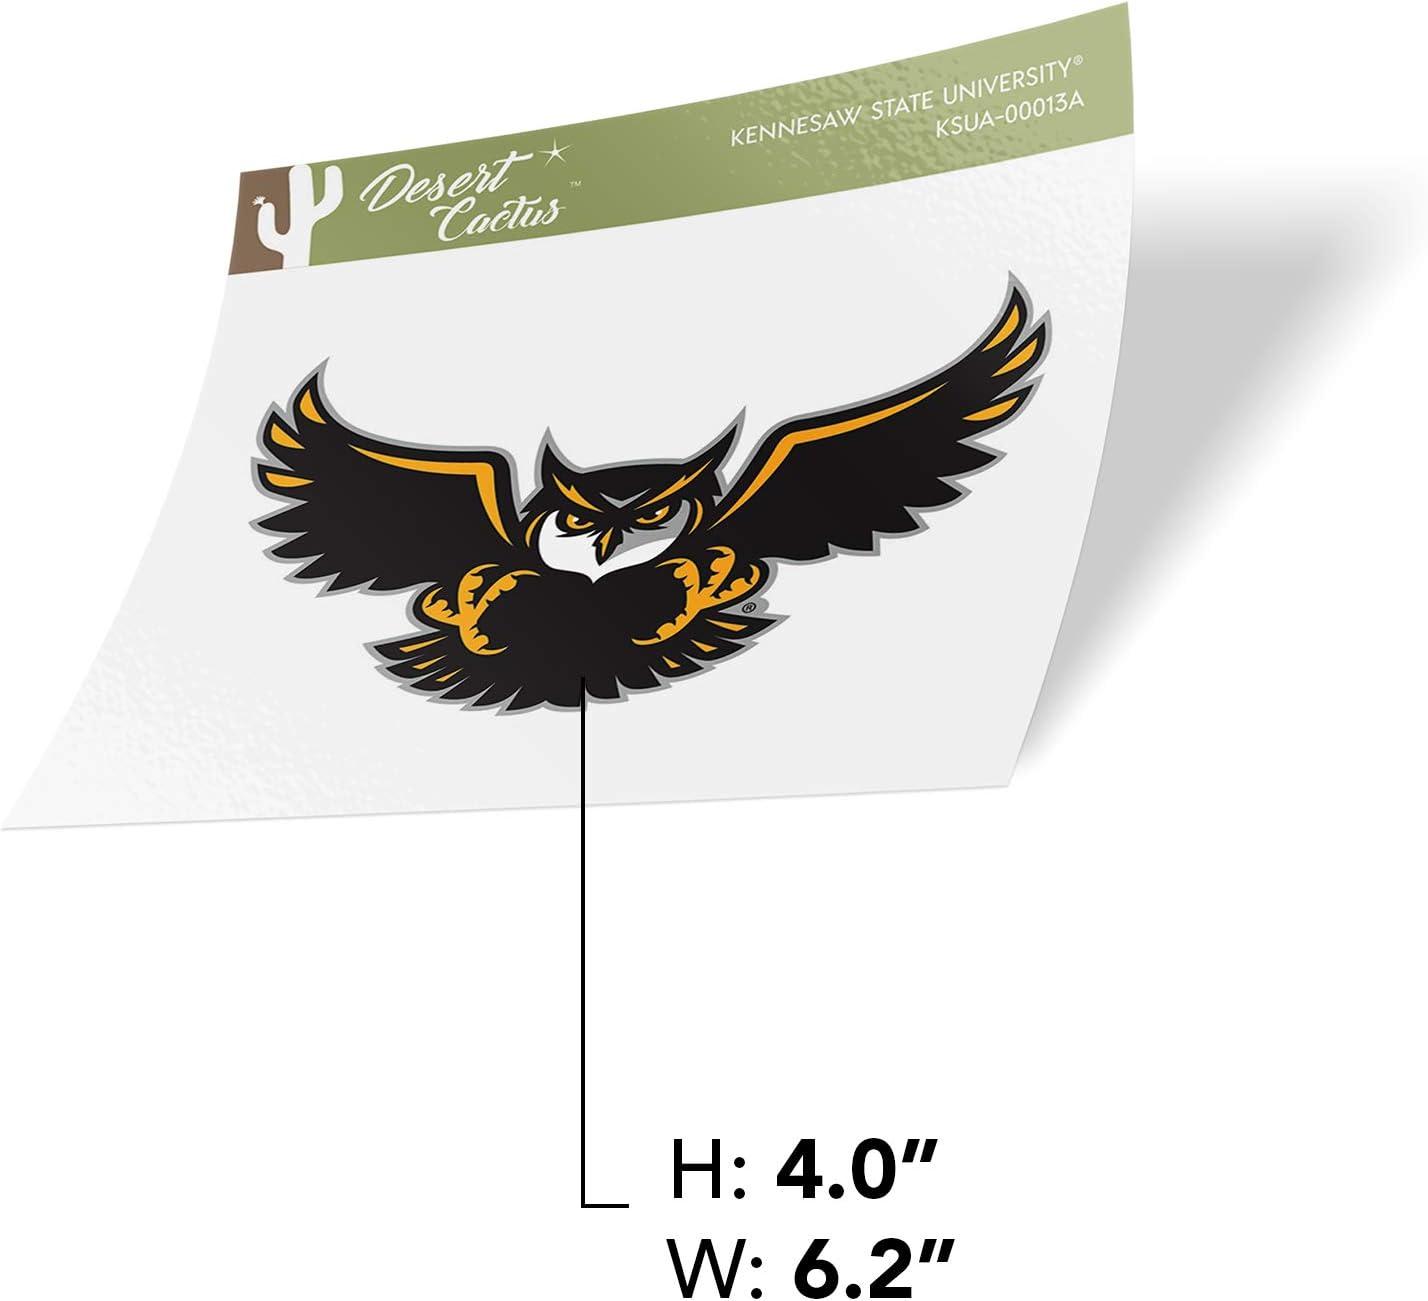 Kennesaw State University KSU Owls NCAA Vinyl Decal Laptop Water Bottle Car Scrapbook Sticker - 00013A